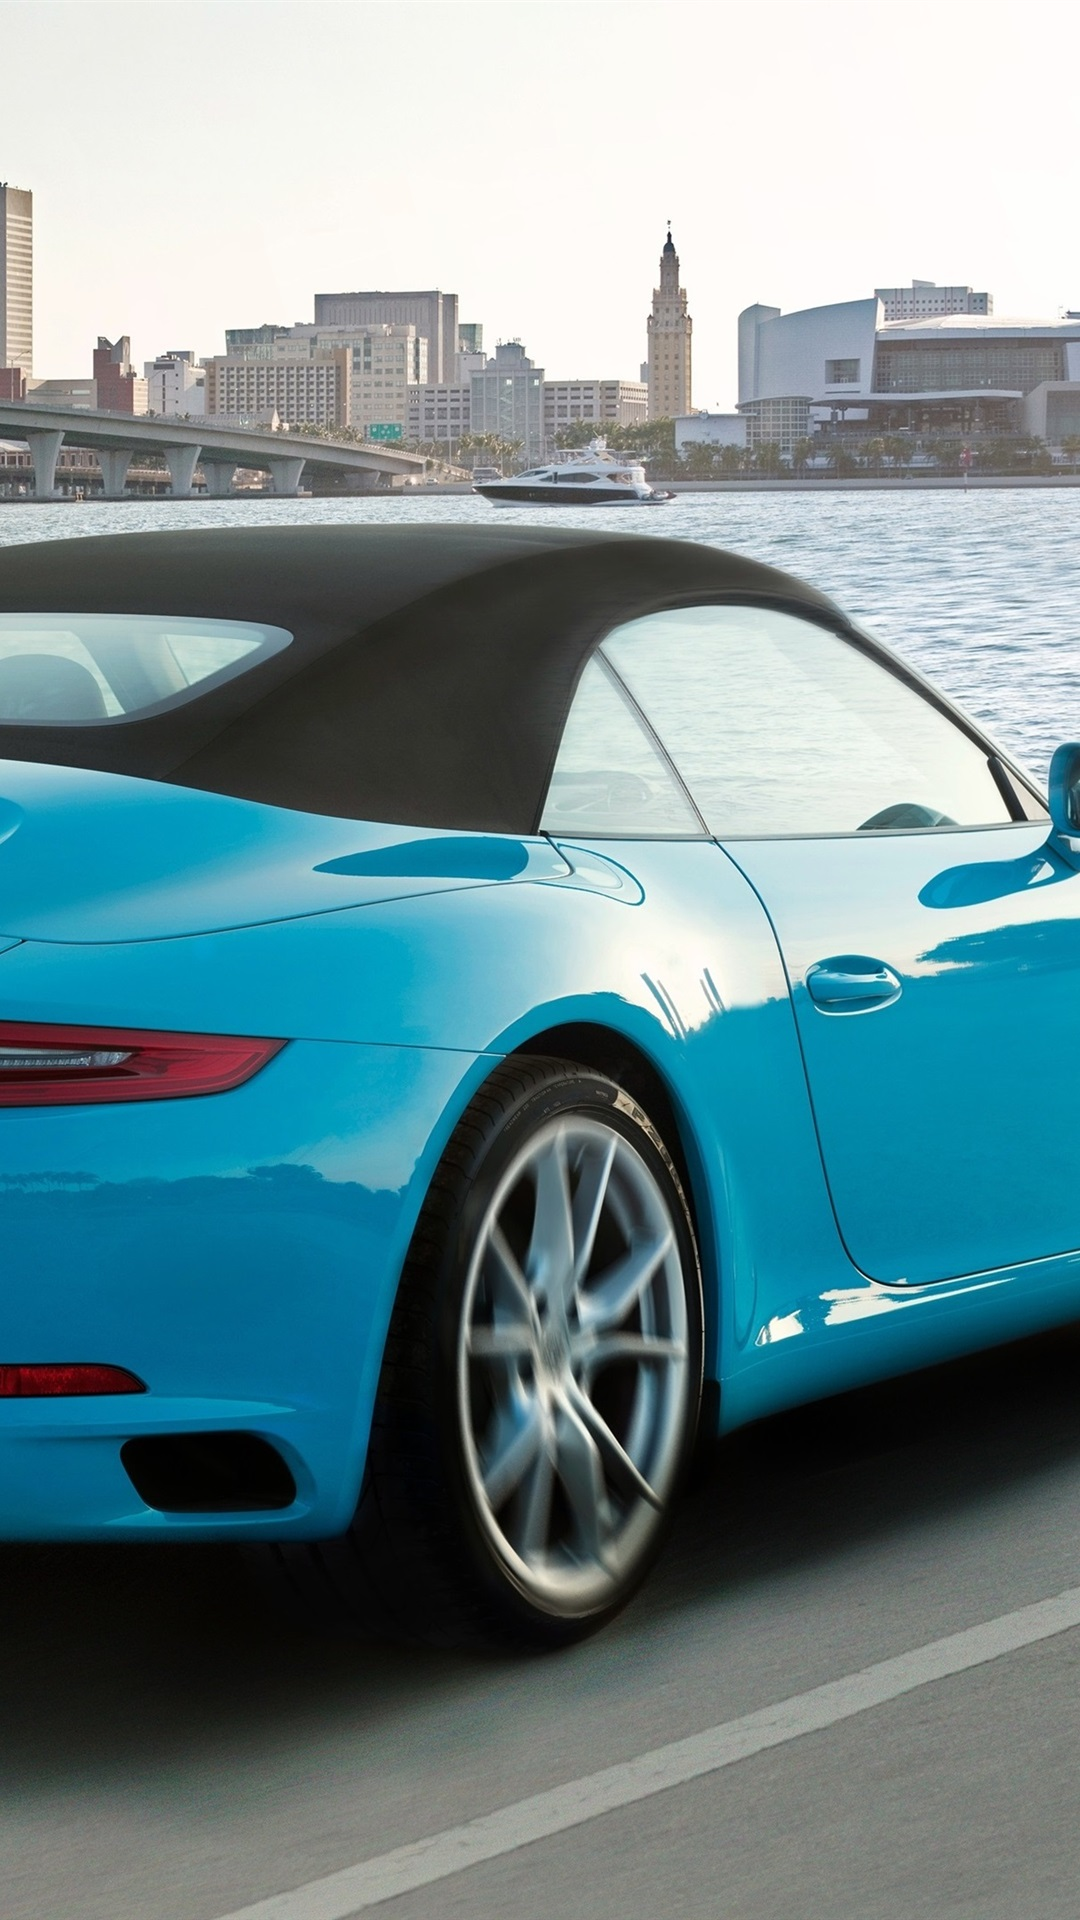 Porsche 911 Carrera S Cabriolet Blue Supercar Back View